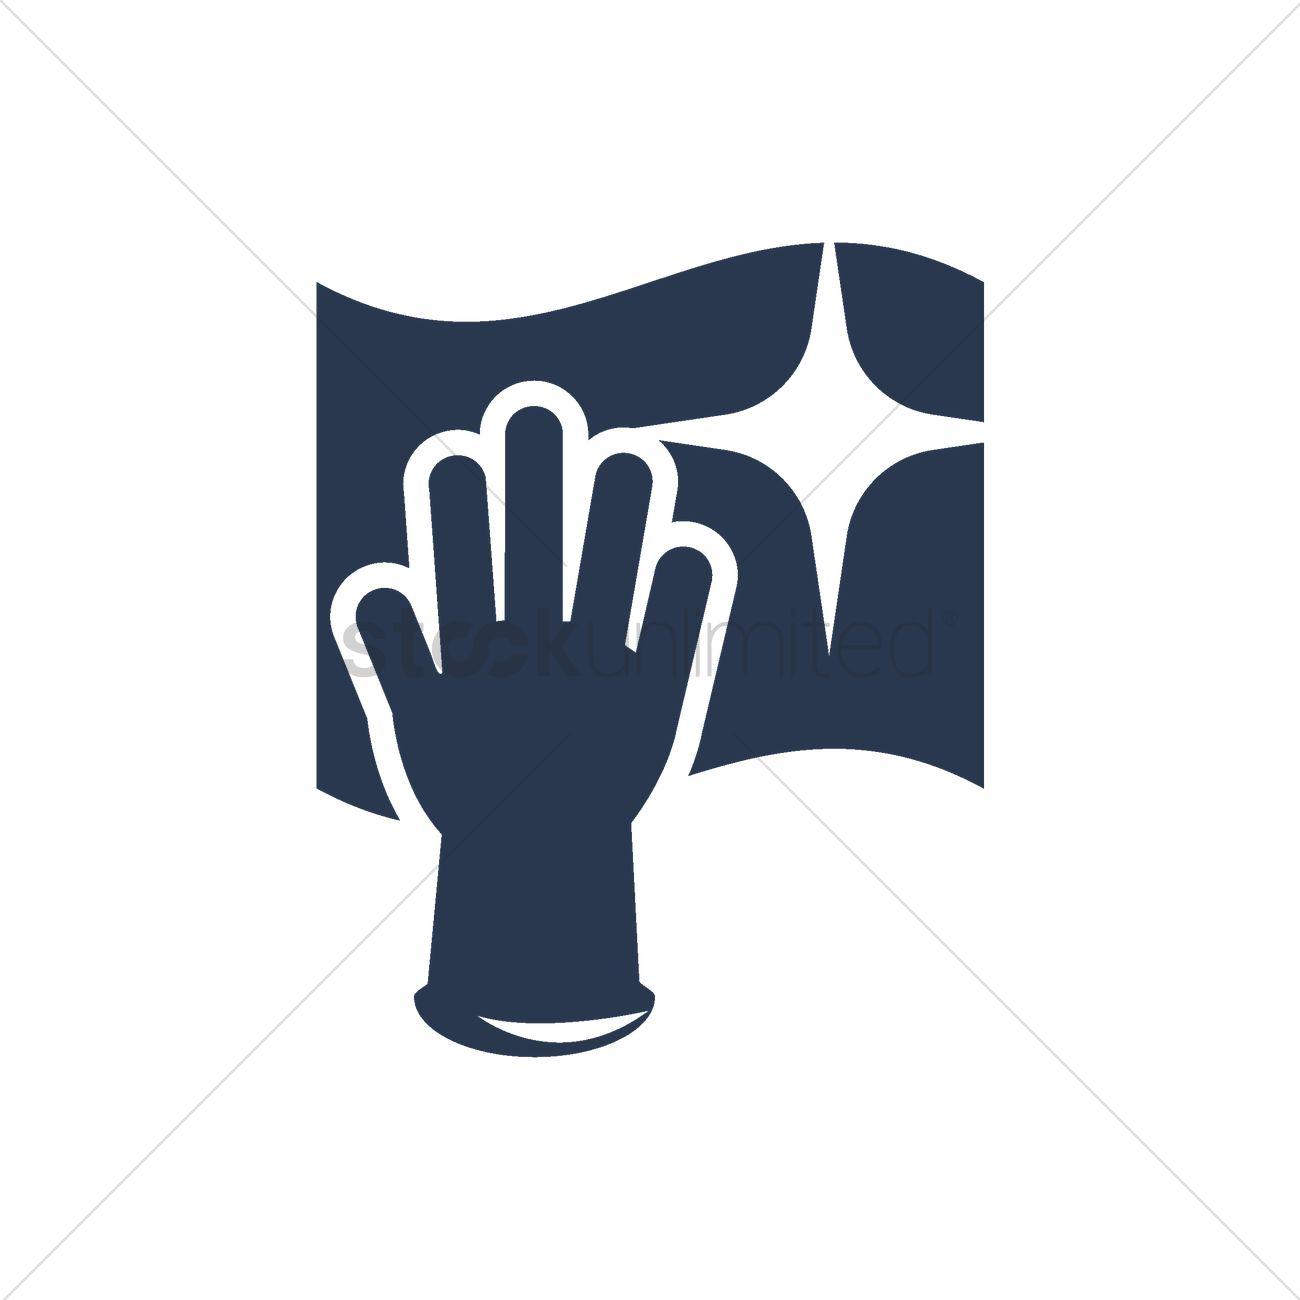 Washing glove and wash cloth vector image 2003964 stockunlimited washing glove and wash cloth vector graphic buycottarizona Image collections